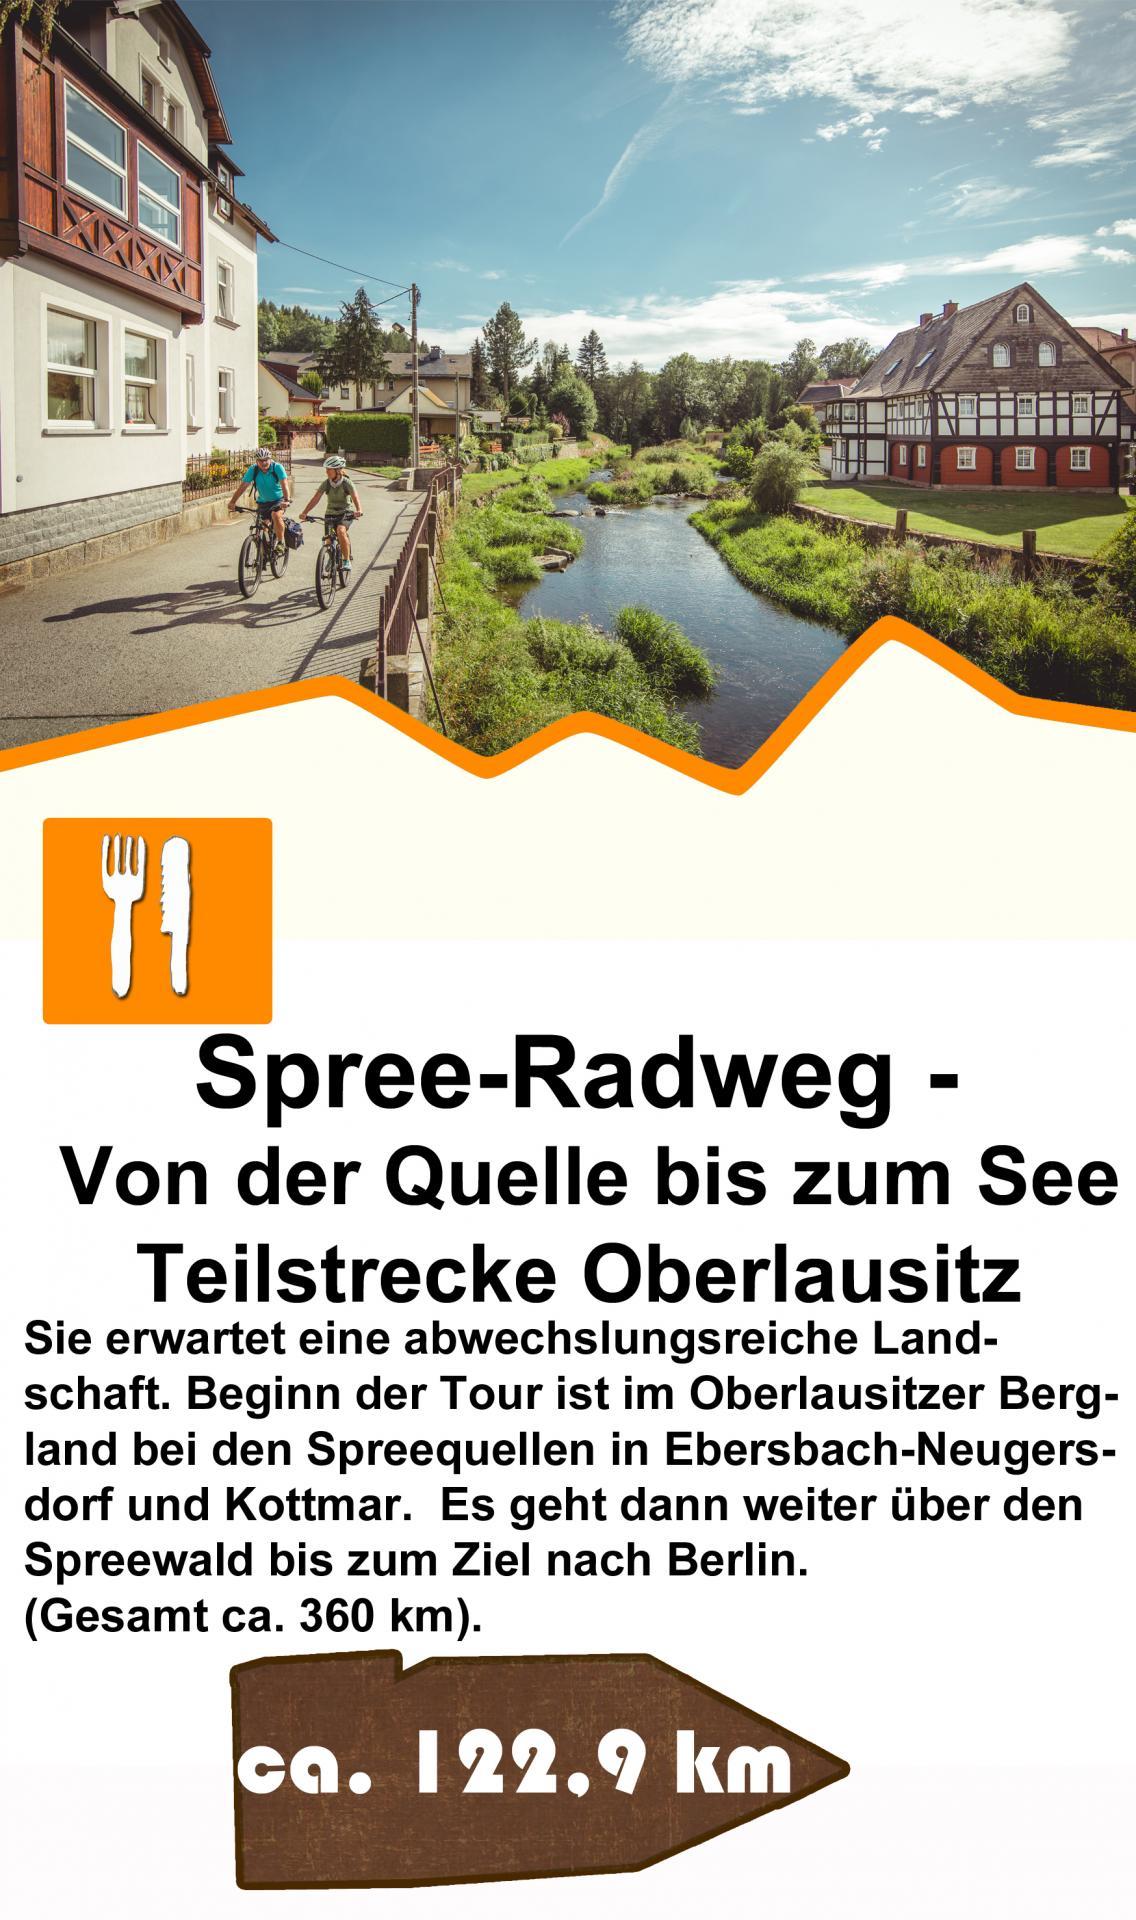 Spreeradweg Teilstrecke Oberlausitz